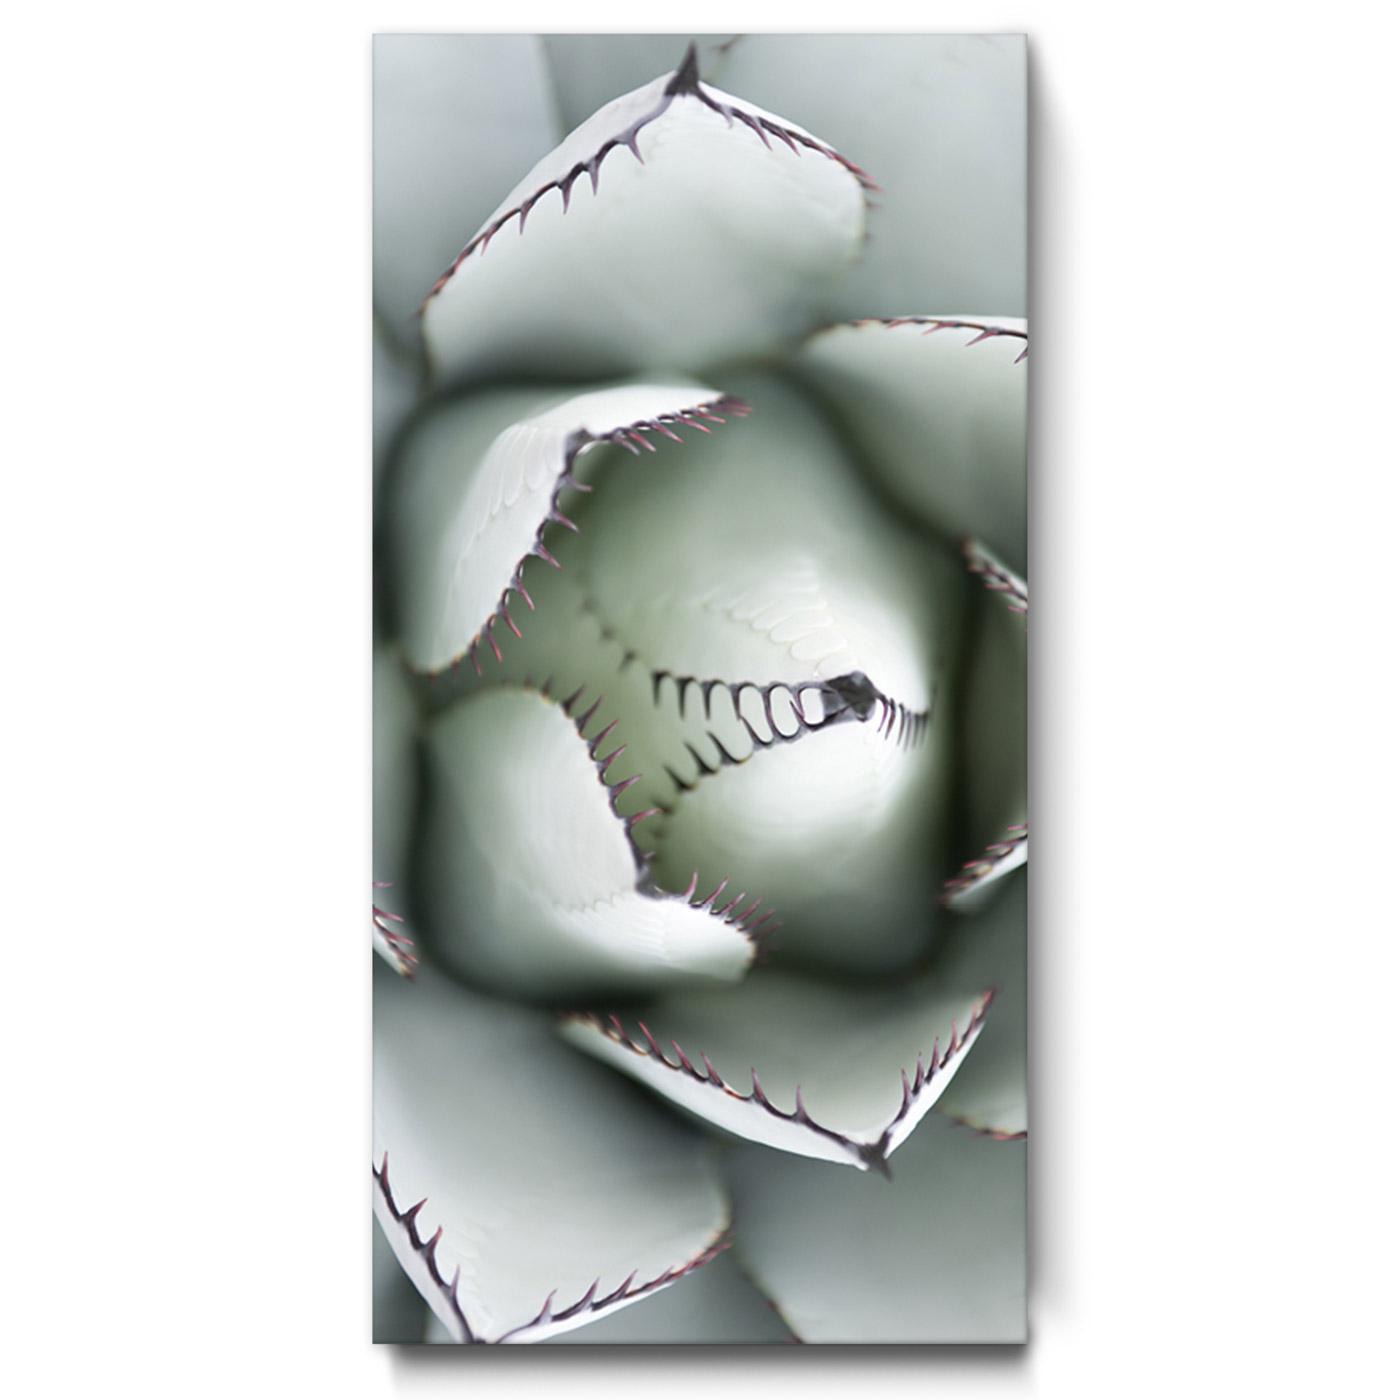 Akustikbild agave i die akustikbild manufaktur - Wandbild hochformat ...